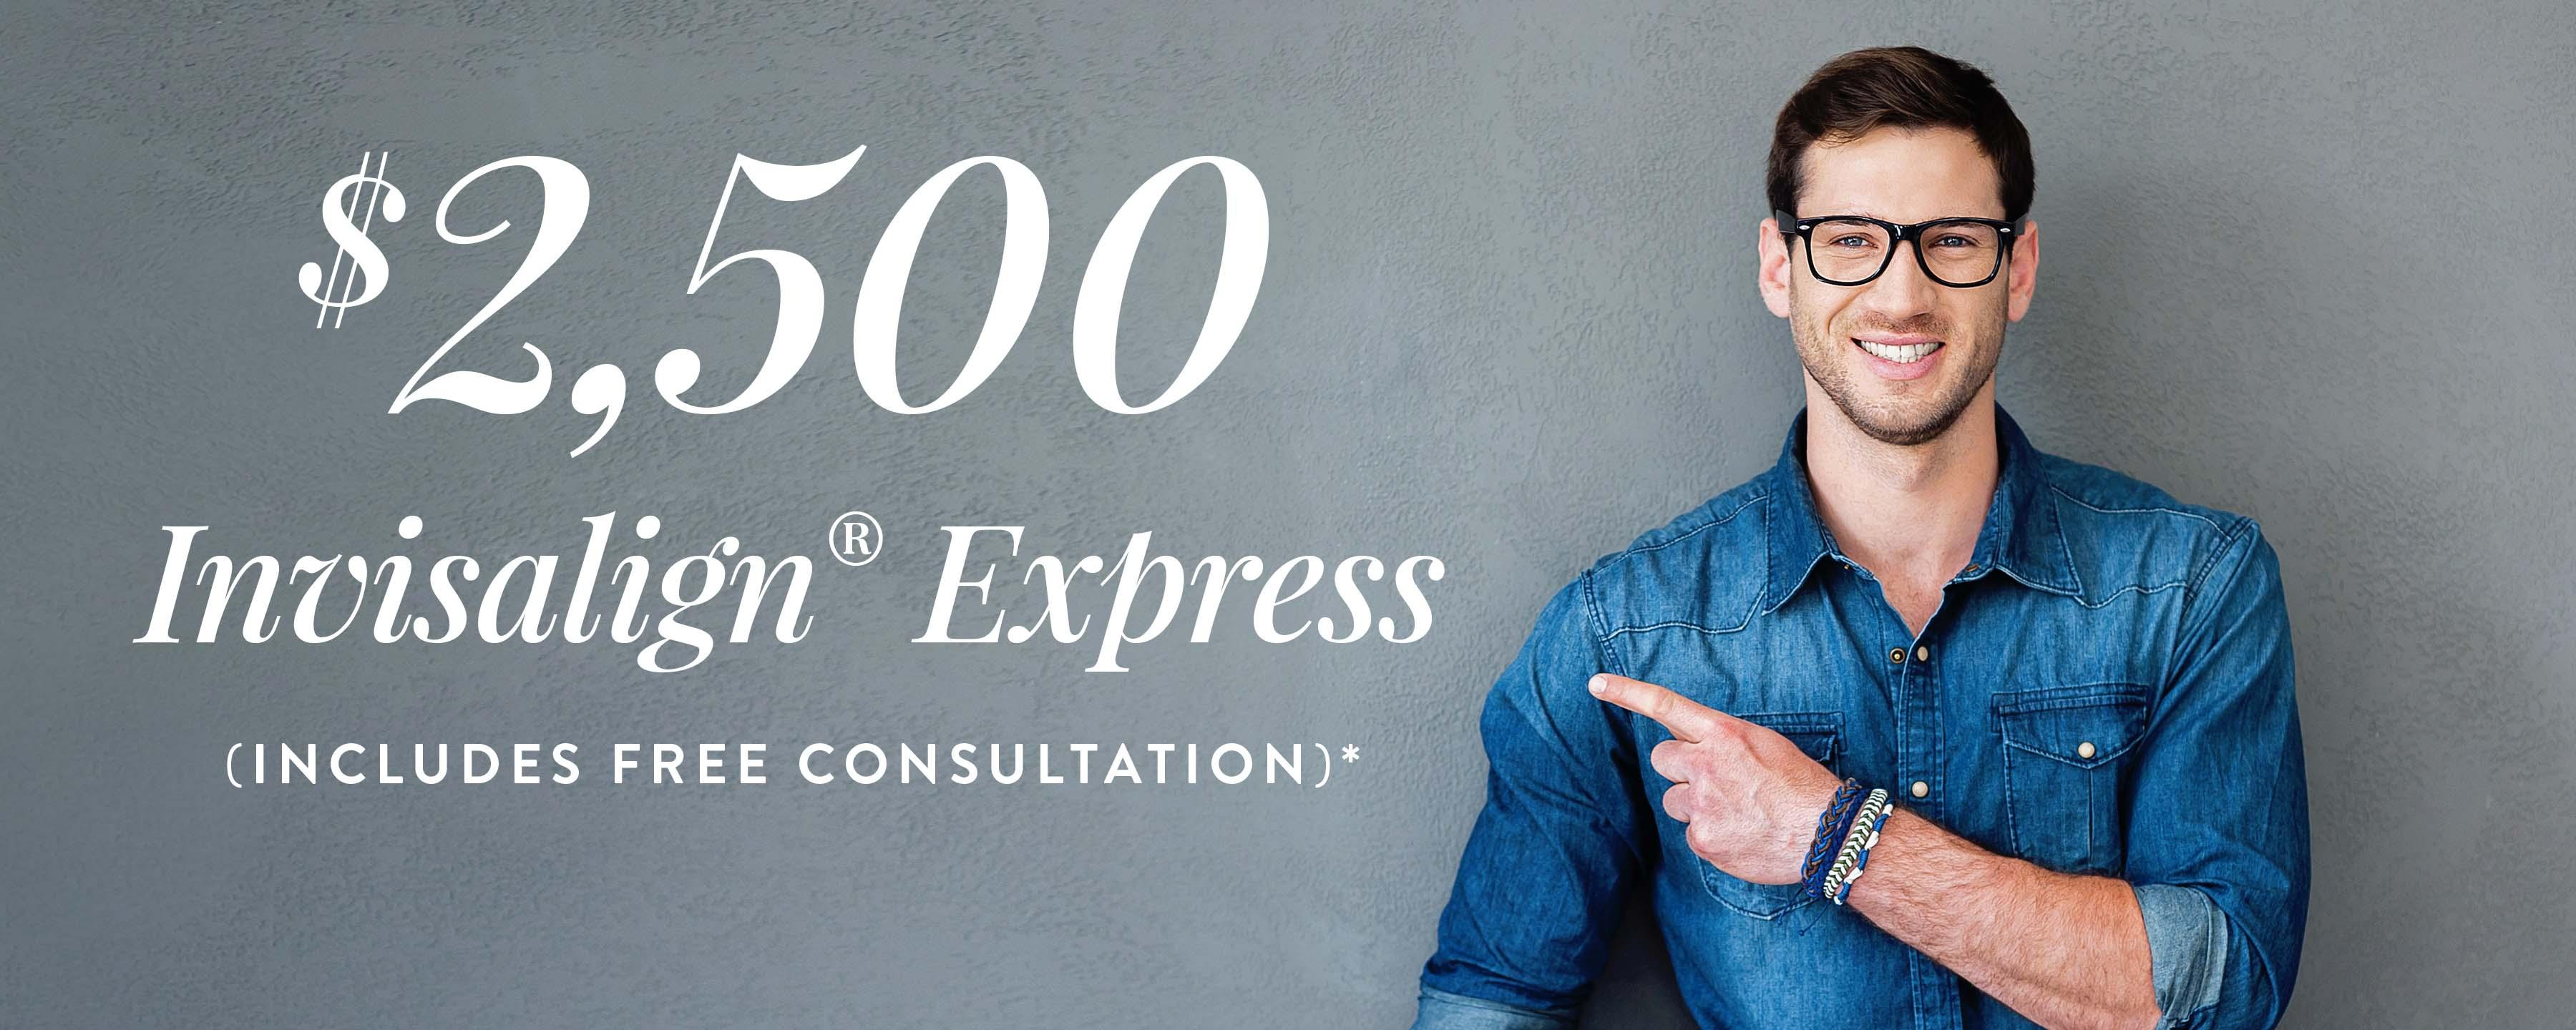 Invisalign Express $2,500*